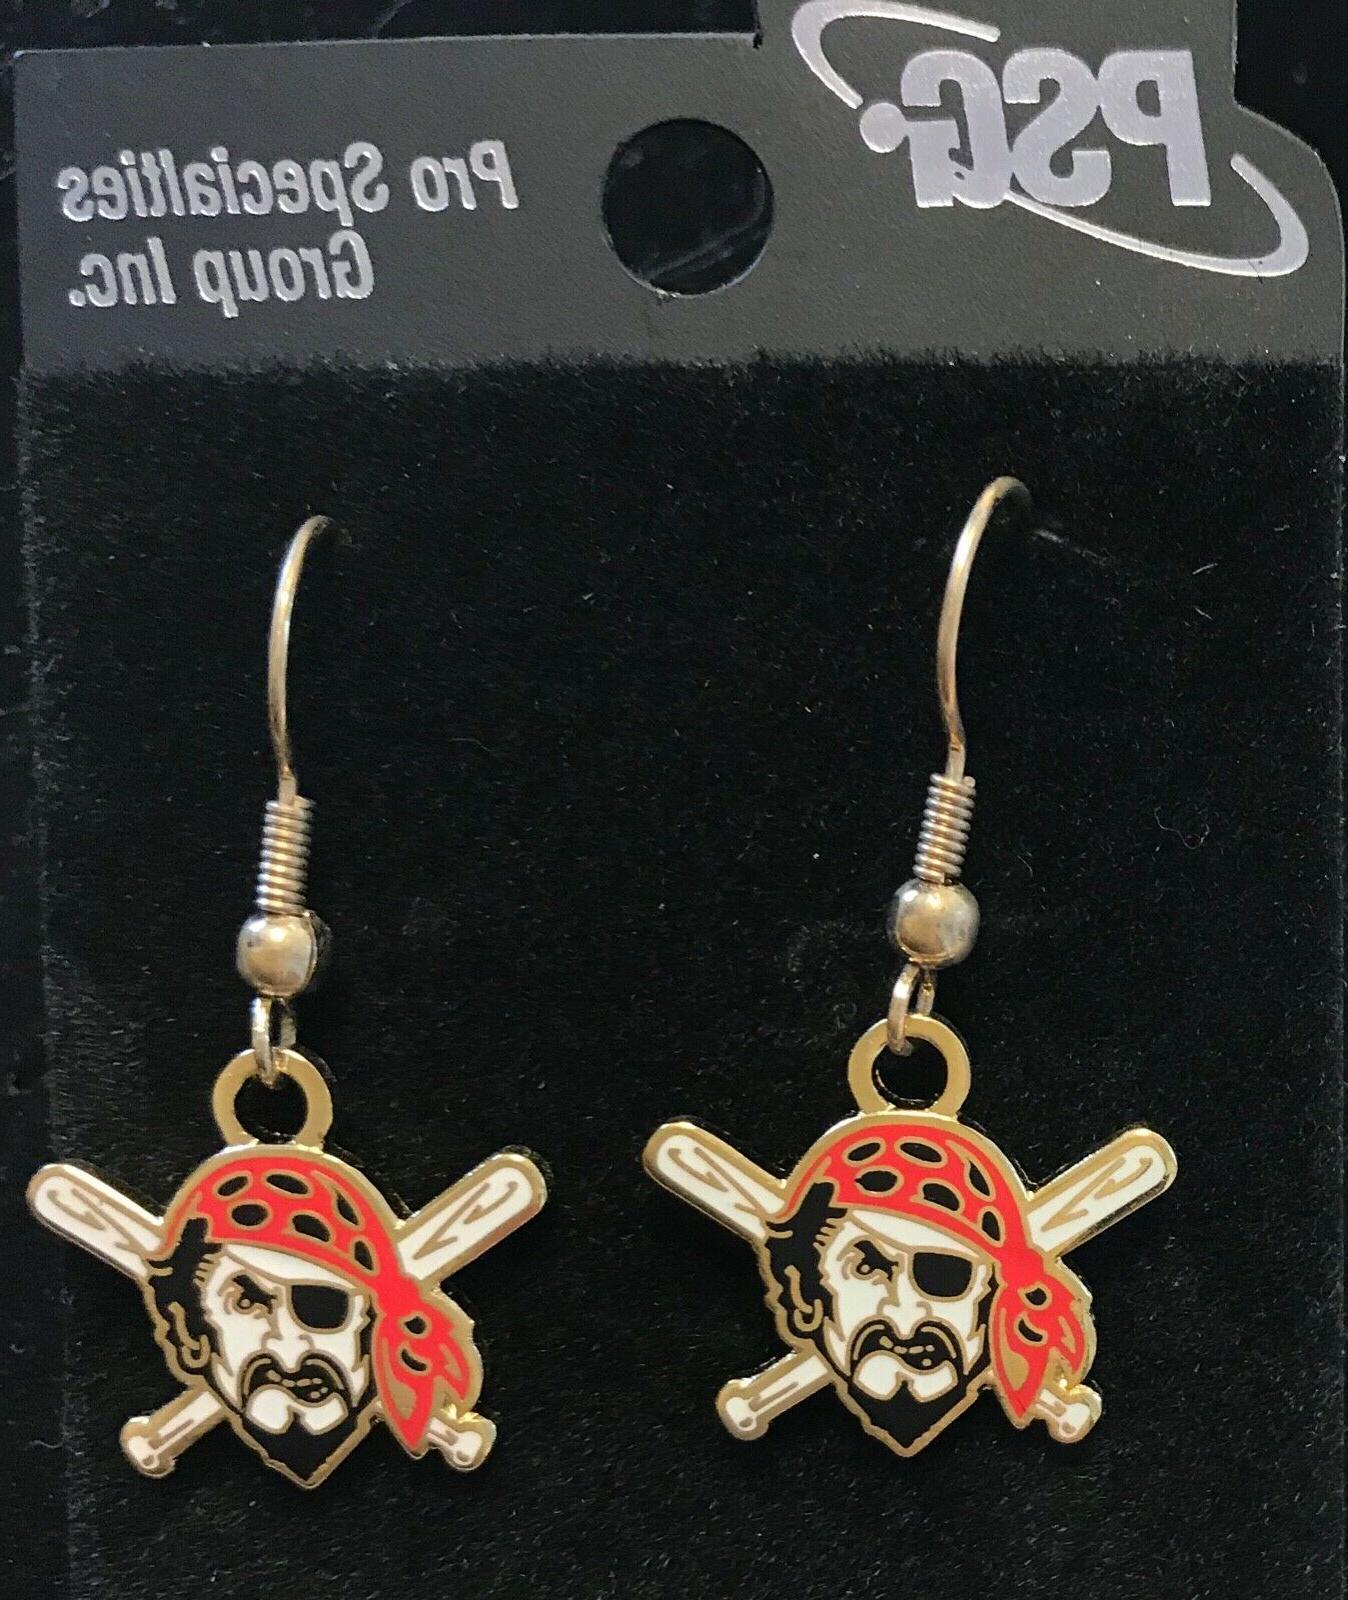 pittsburgh pirates logo j hook earrings new